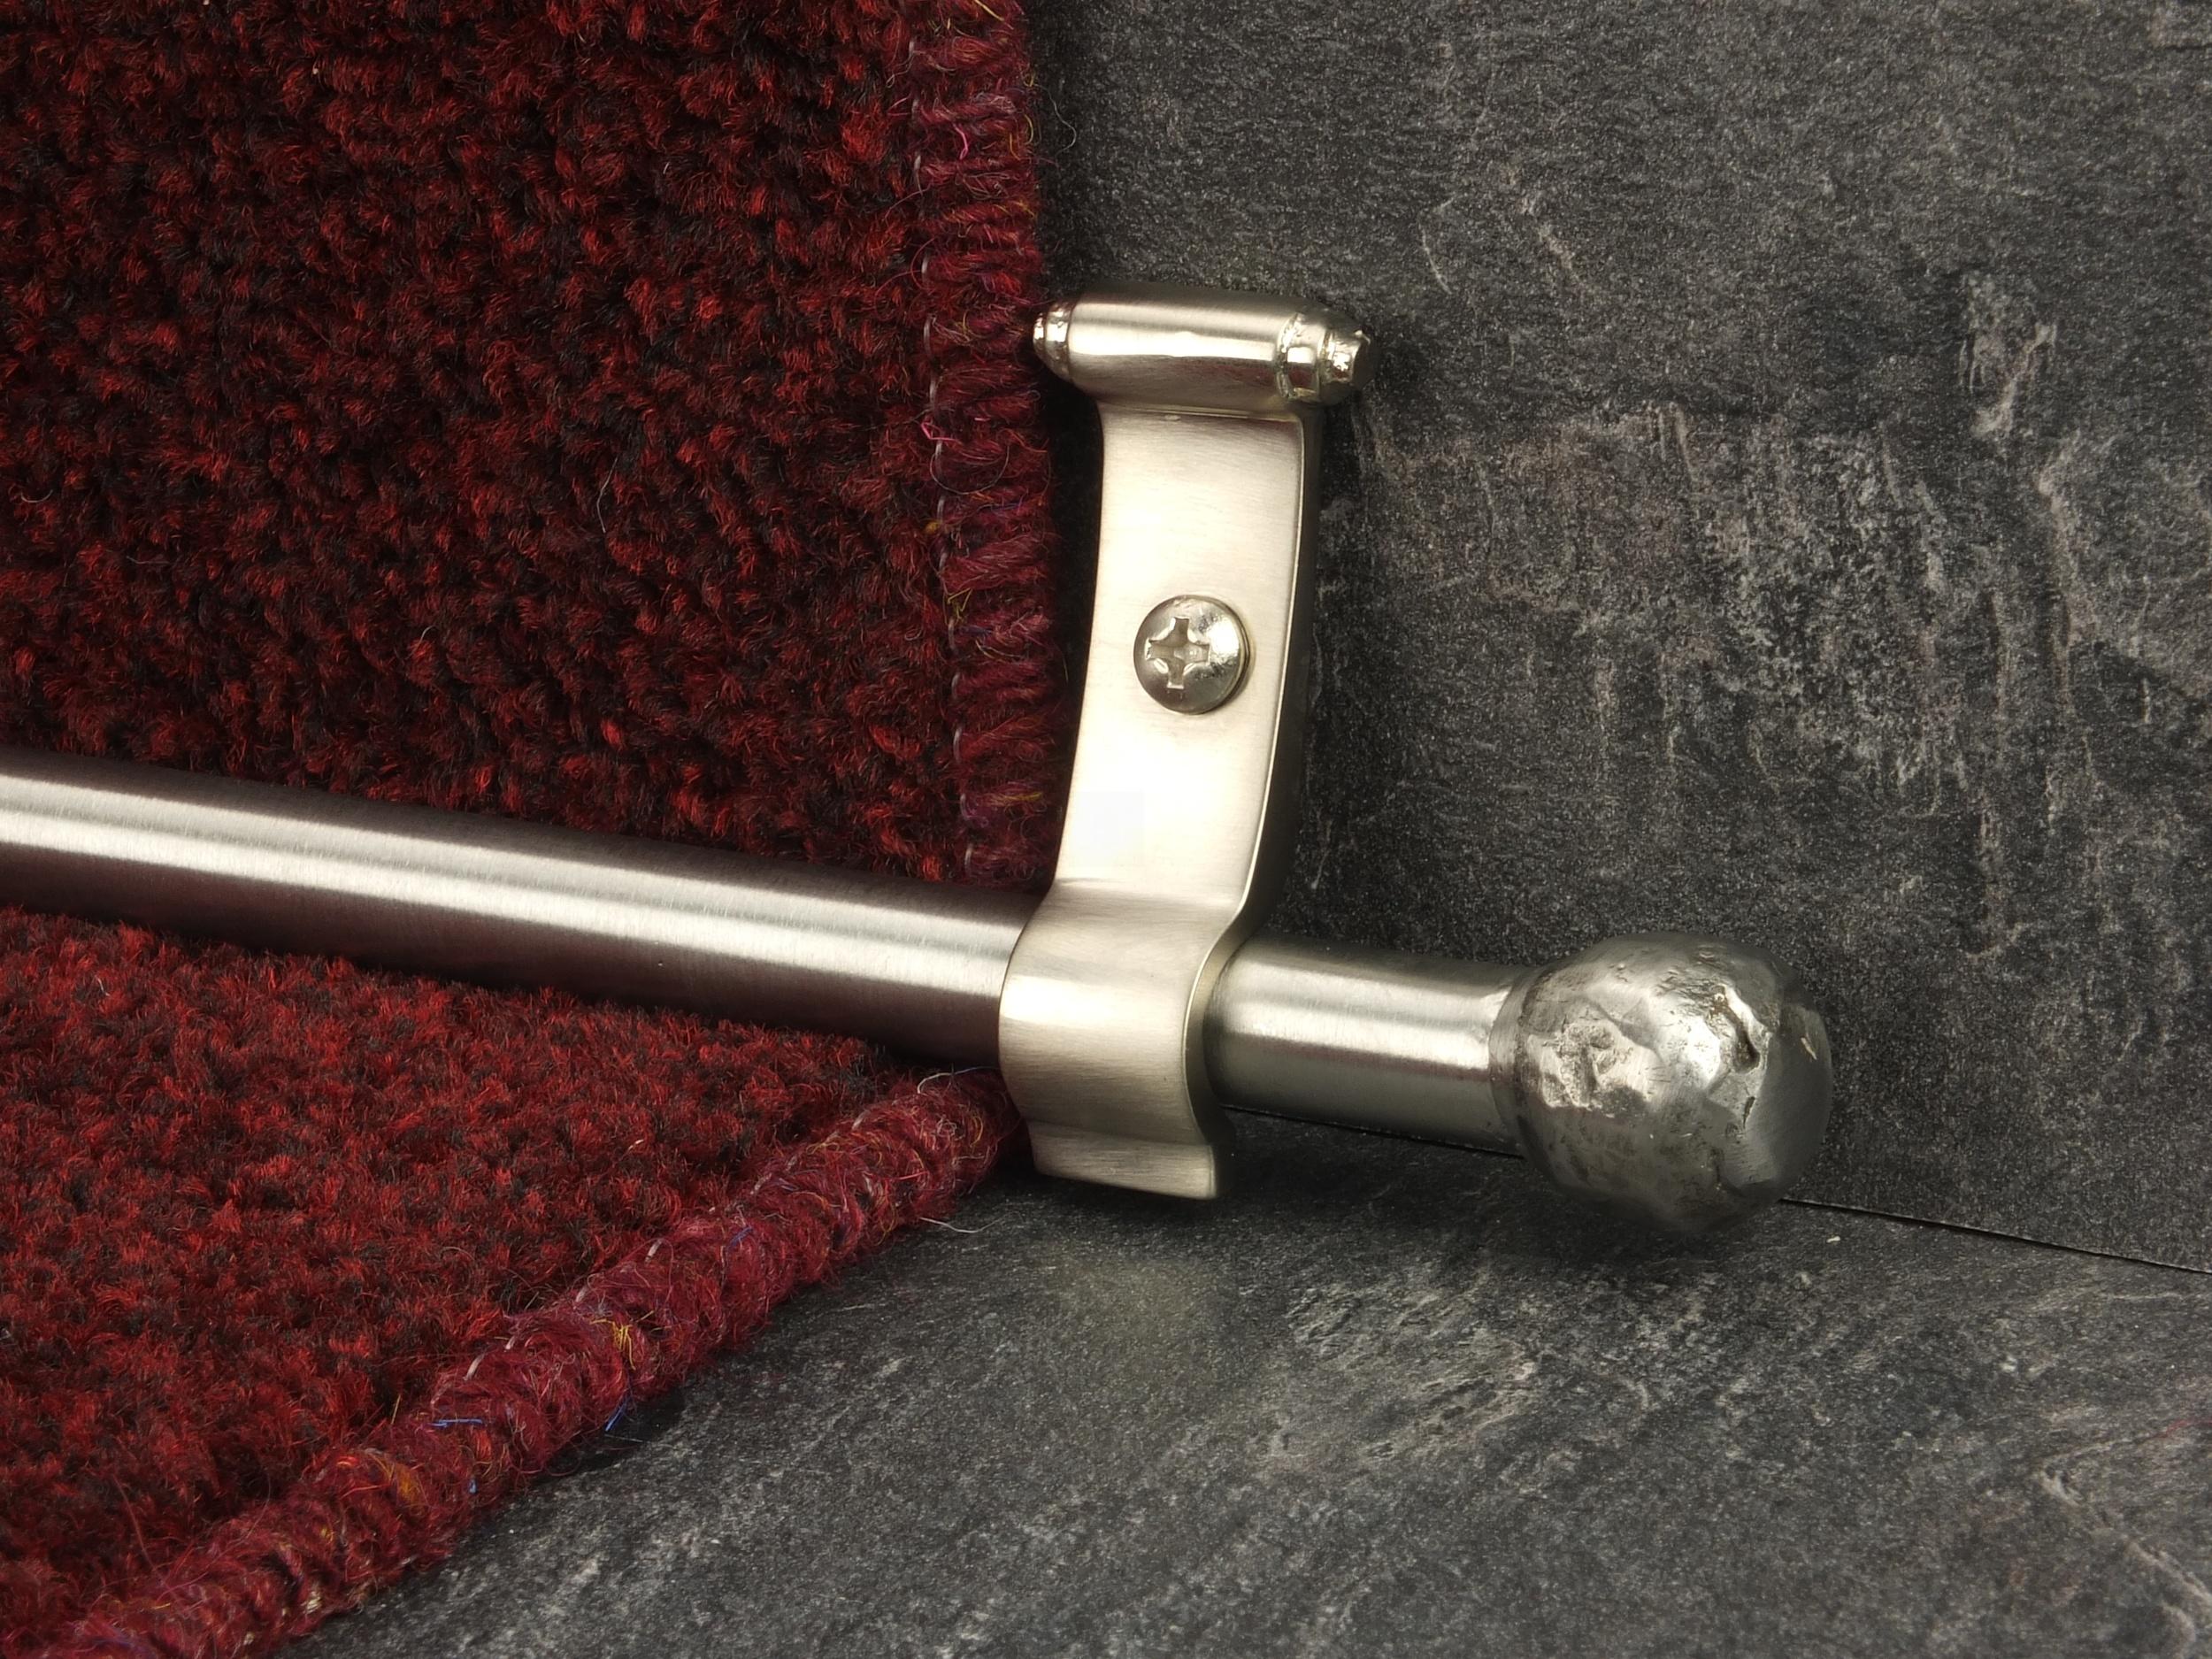 stairrods-blacksmith-stainless-steel 6.jpg